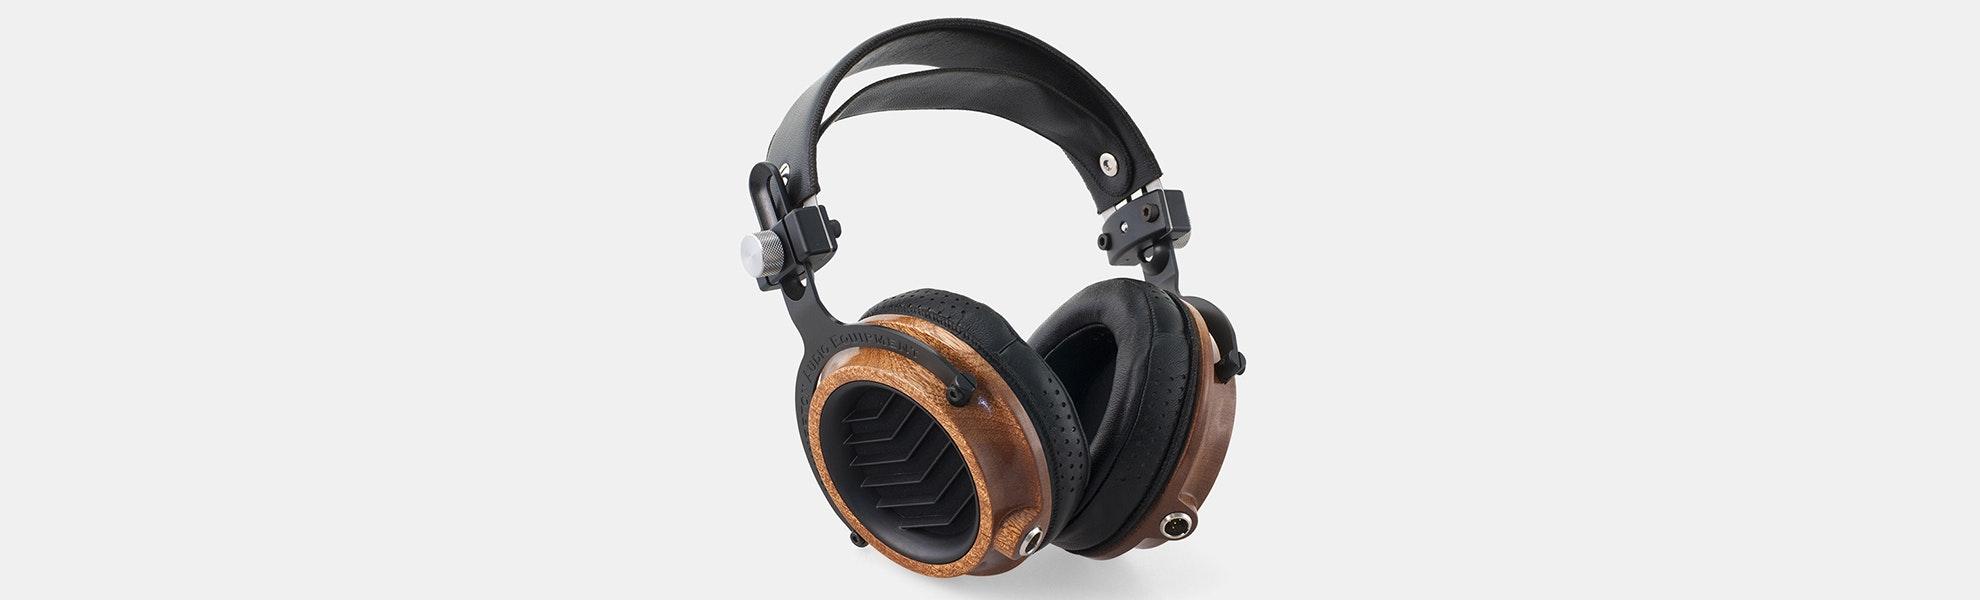 Kennerton Odin Sapele Headphones